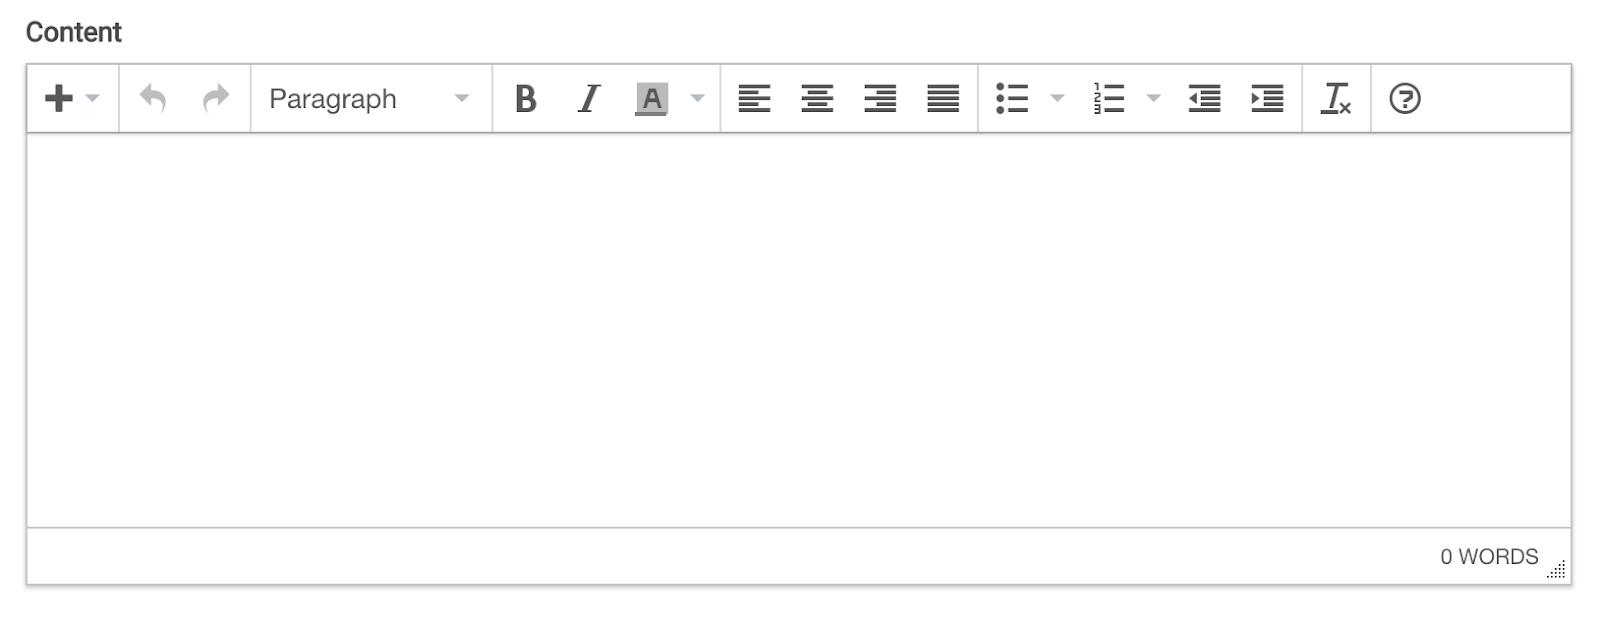 Writing Content in billfolda from editor